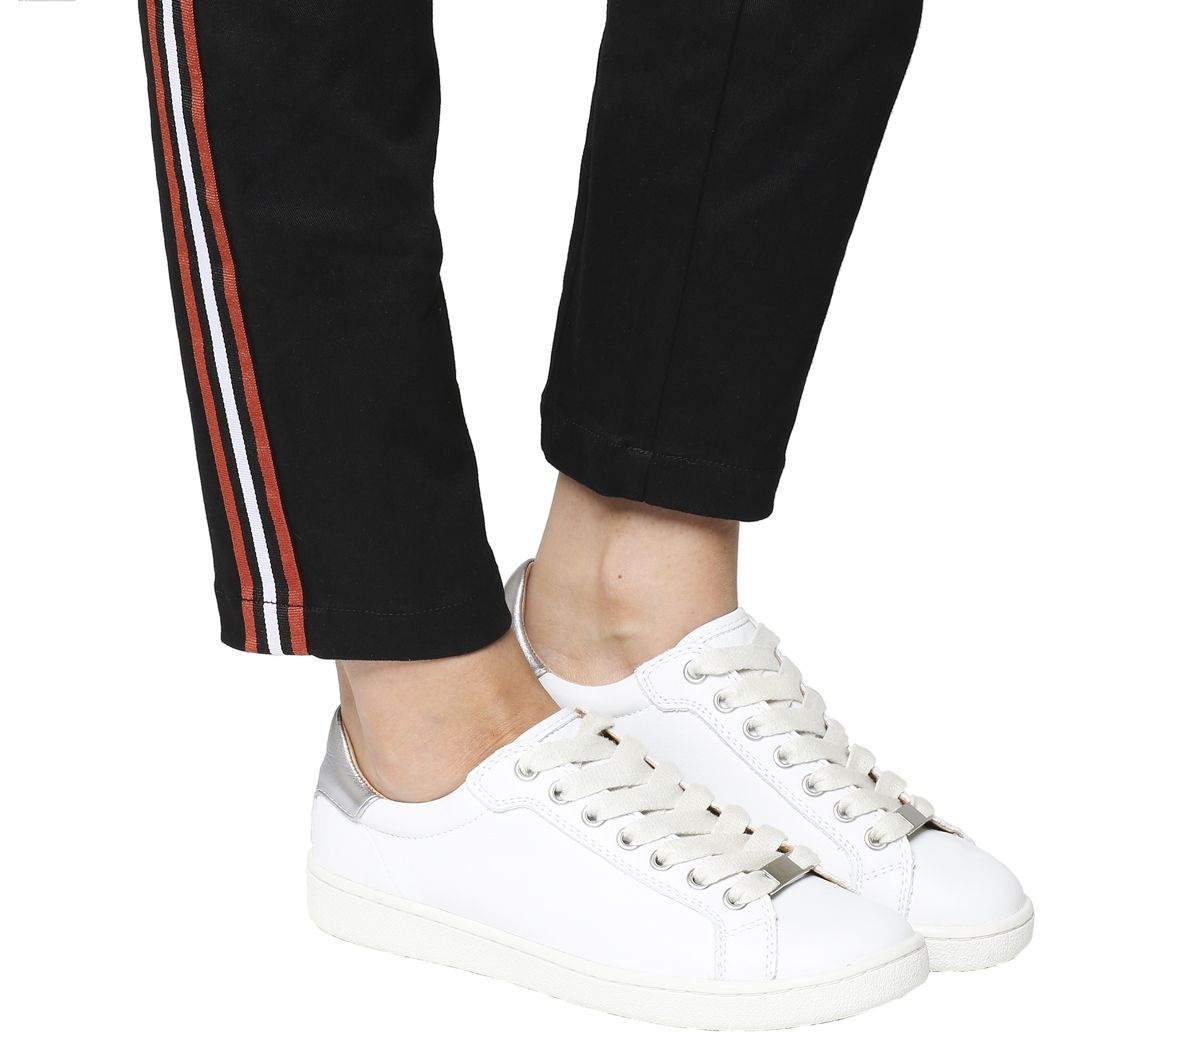 ae60346b6a4 Milo Sneakers